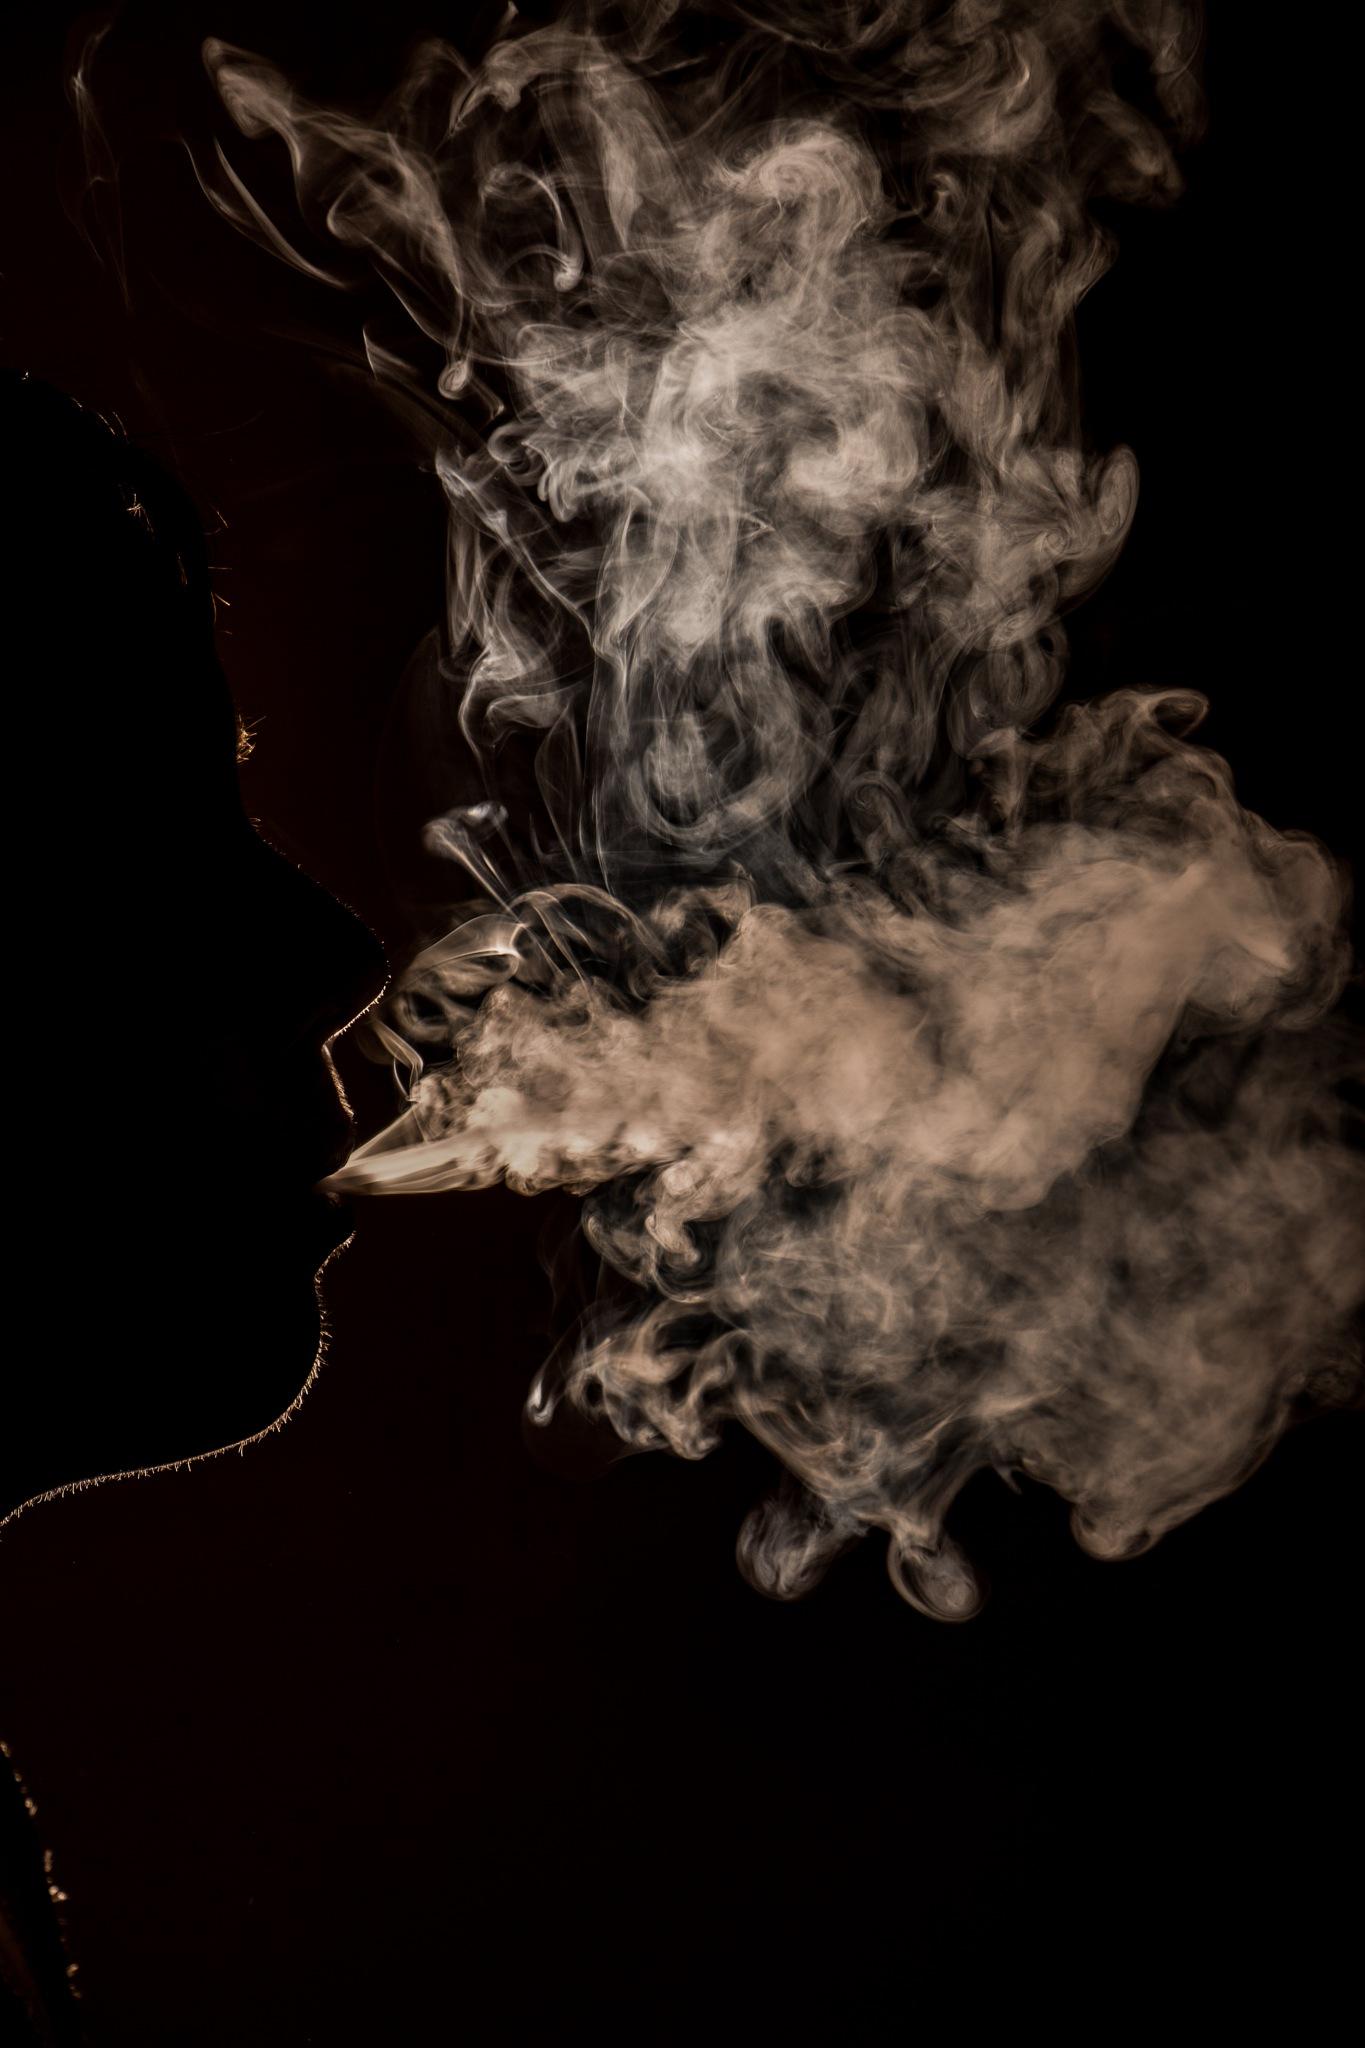 Smokereaper by Patrik Kjellberg